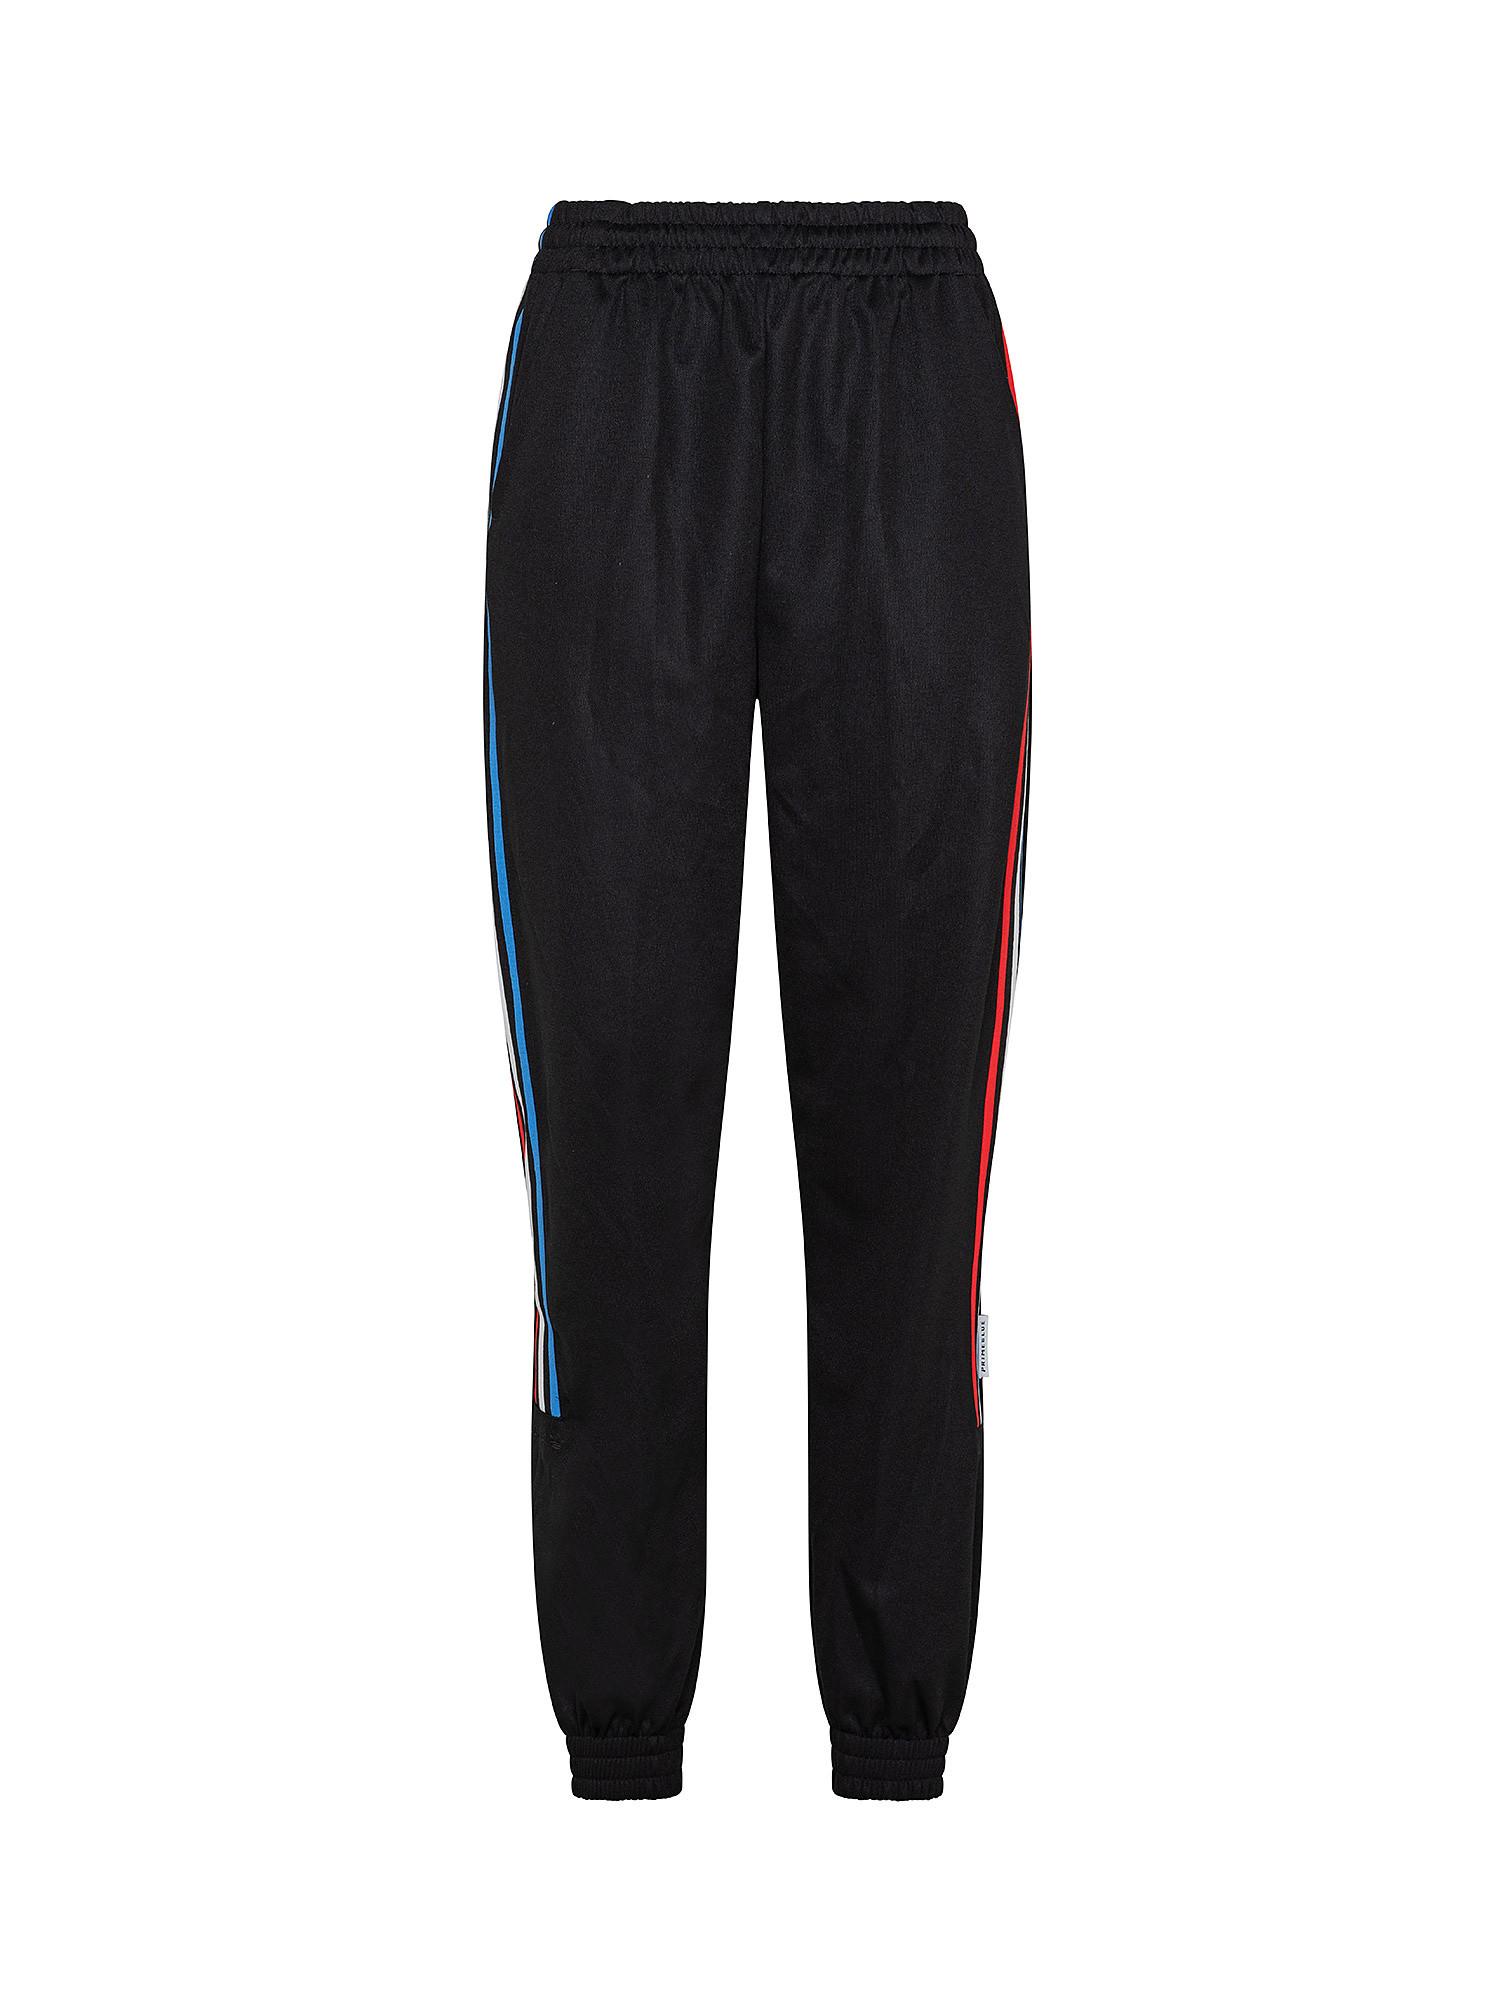 Pantaloni tuta adicolor Tricolor Primeblue, Nero, large image number 0